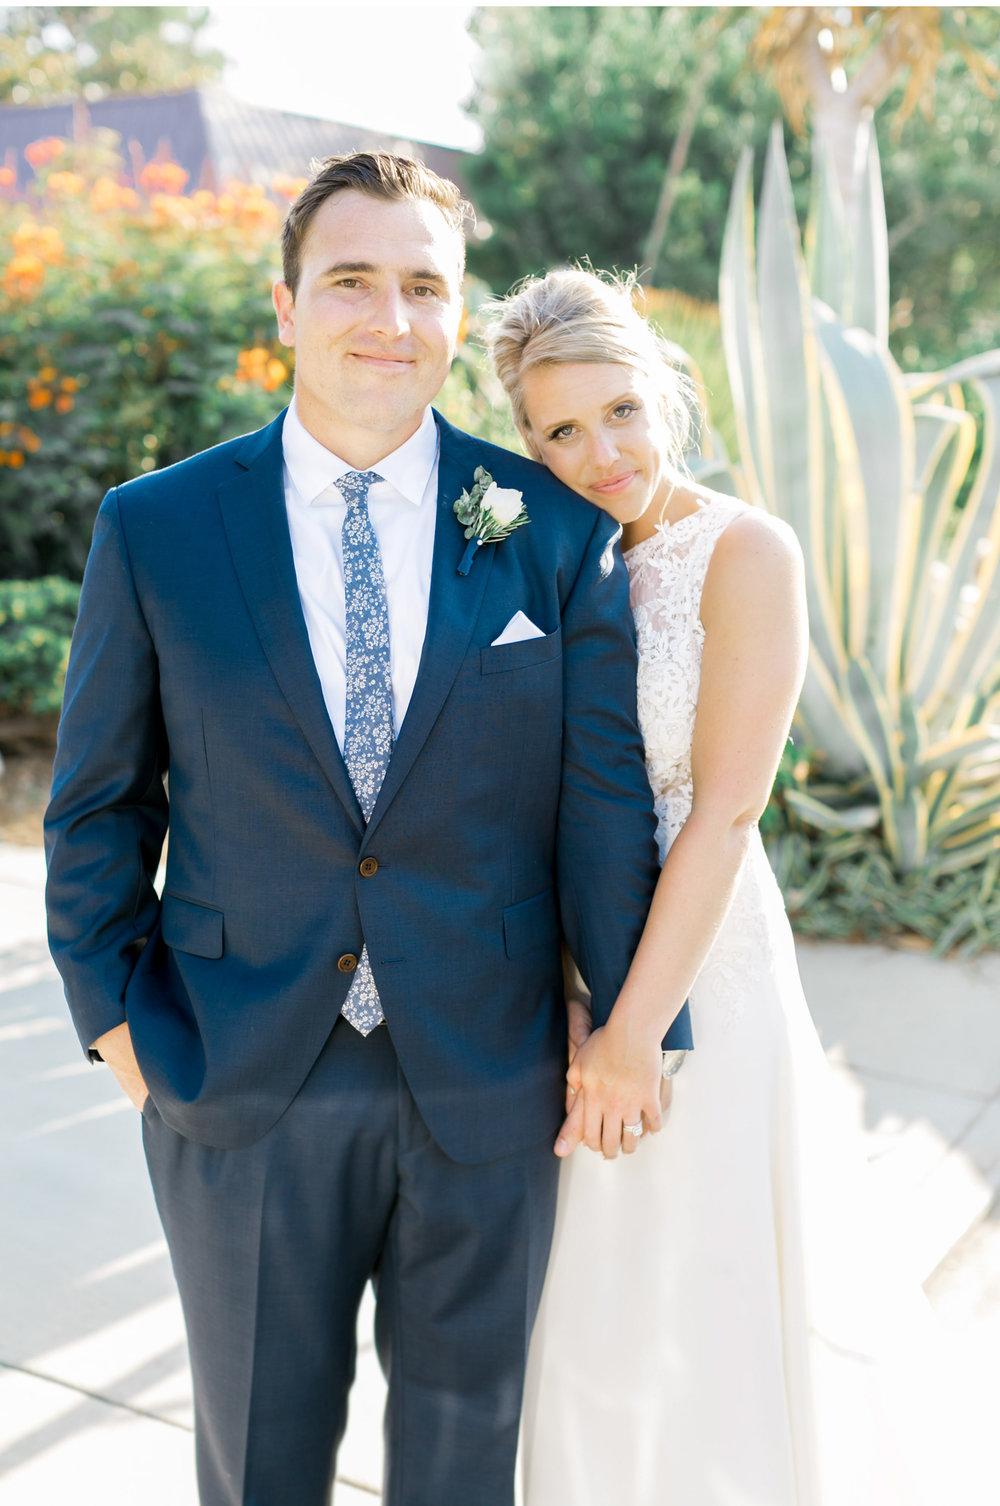 Malibu-Wedding-Photographer-Natalie-Schutt-Photography-Fine-Art-Film-Photography_12.jpg